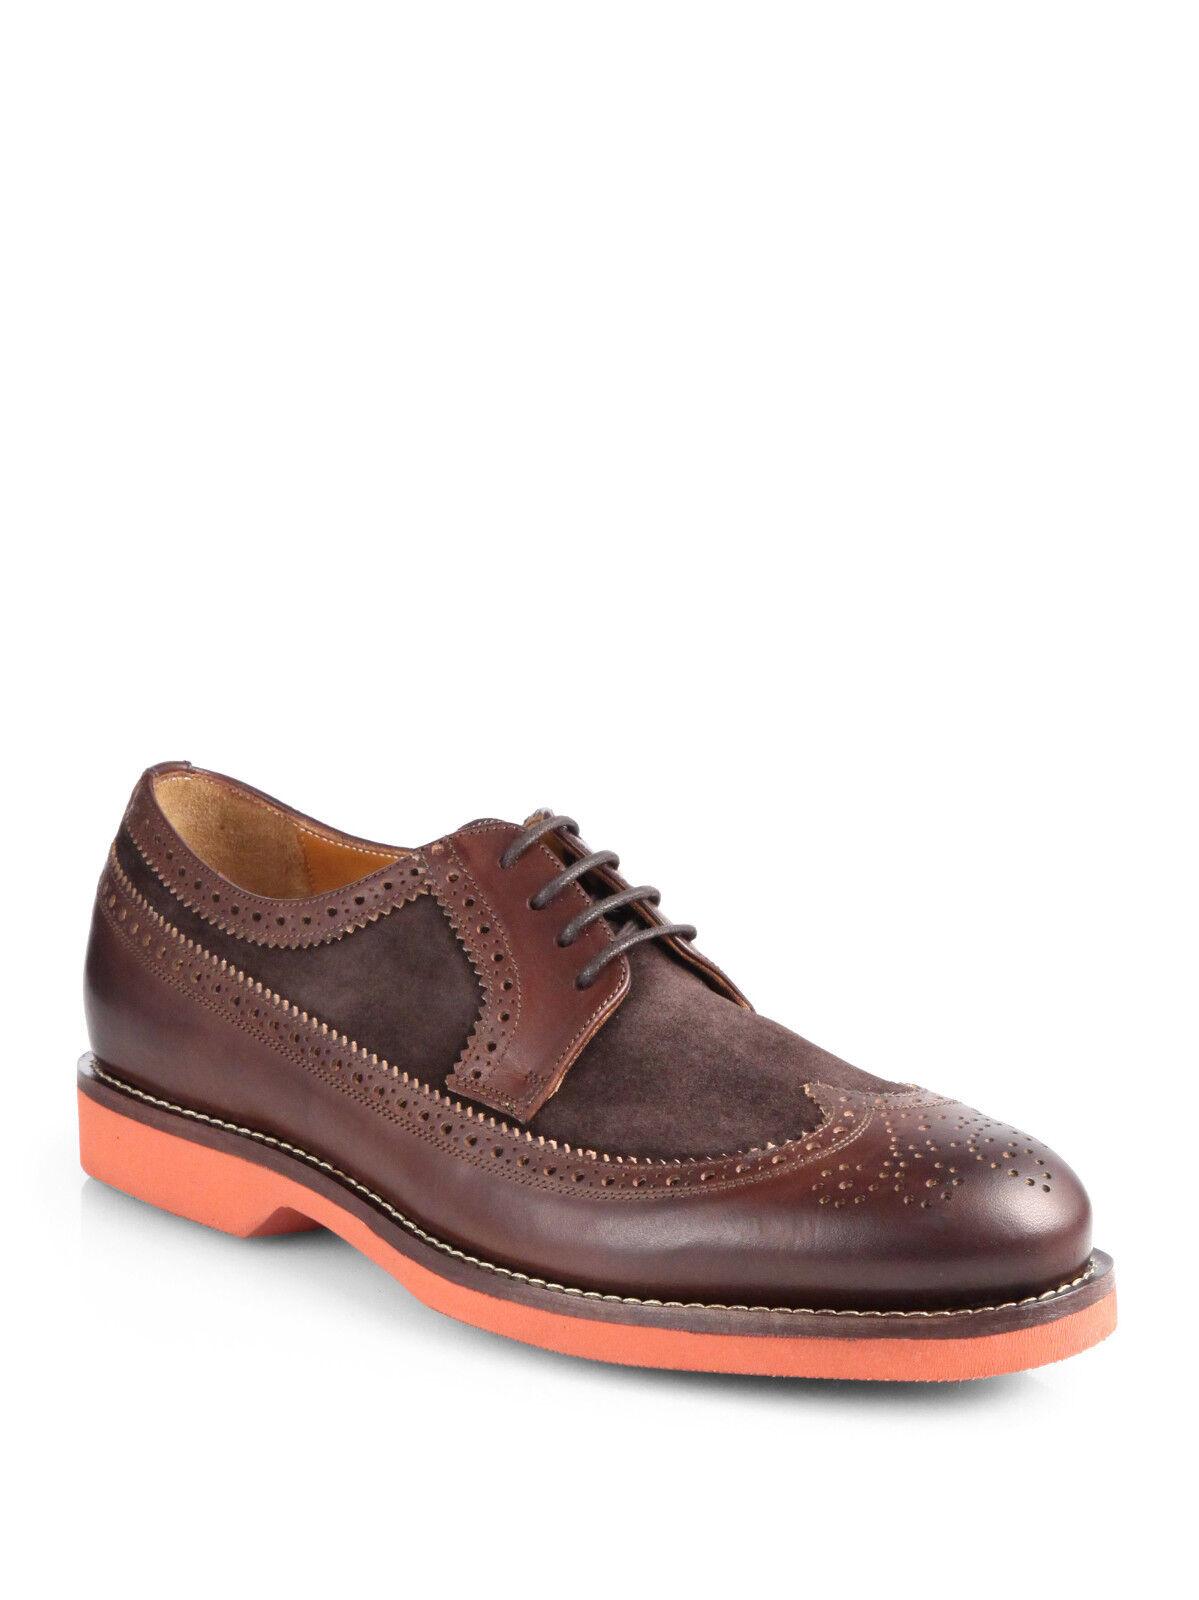 Polo Ralph Lauren Dark marrone Suede Pelle Pelle Pelle Hoover Wingtip Oxfords Scarpe New  550 54d190